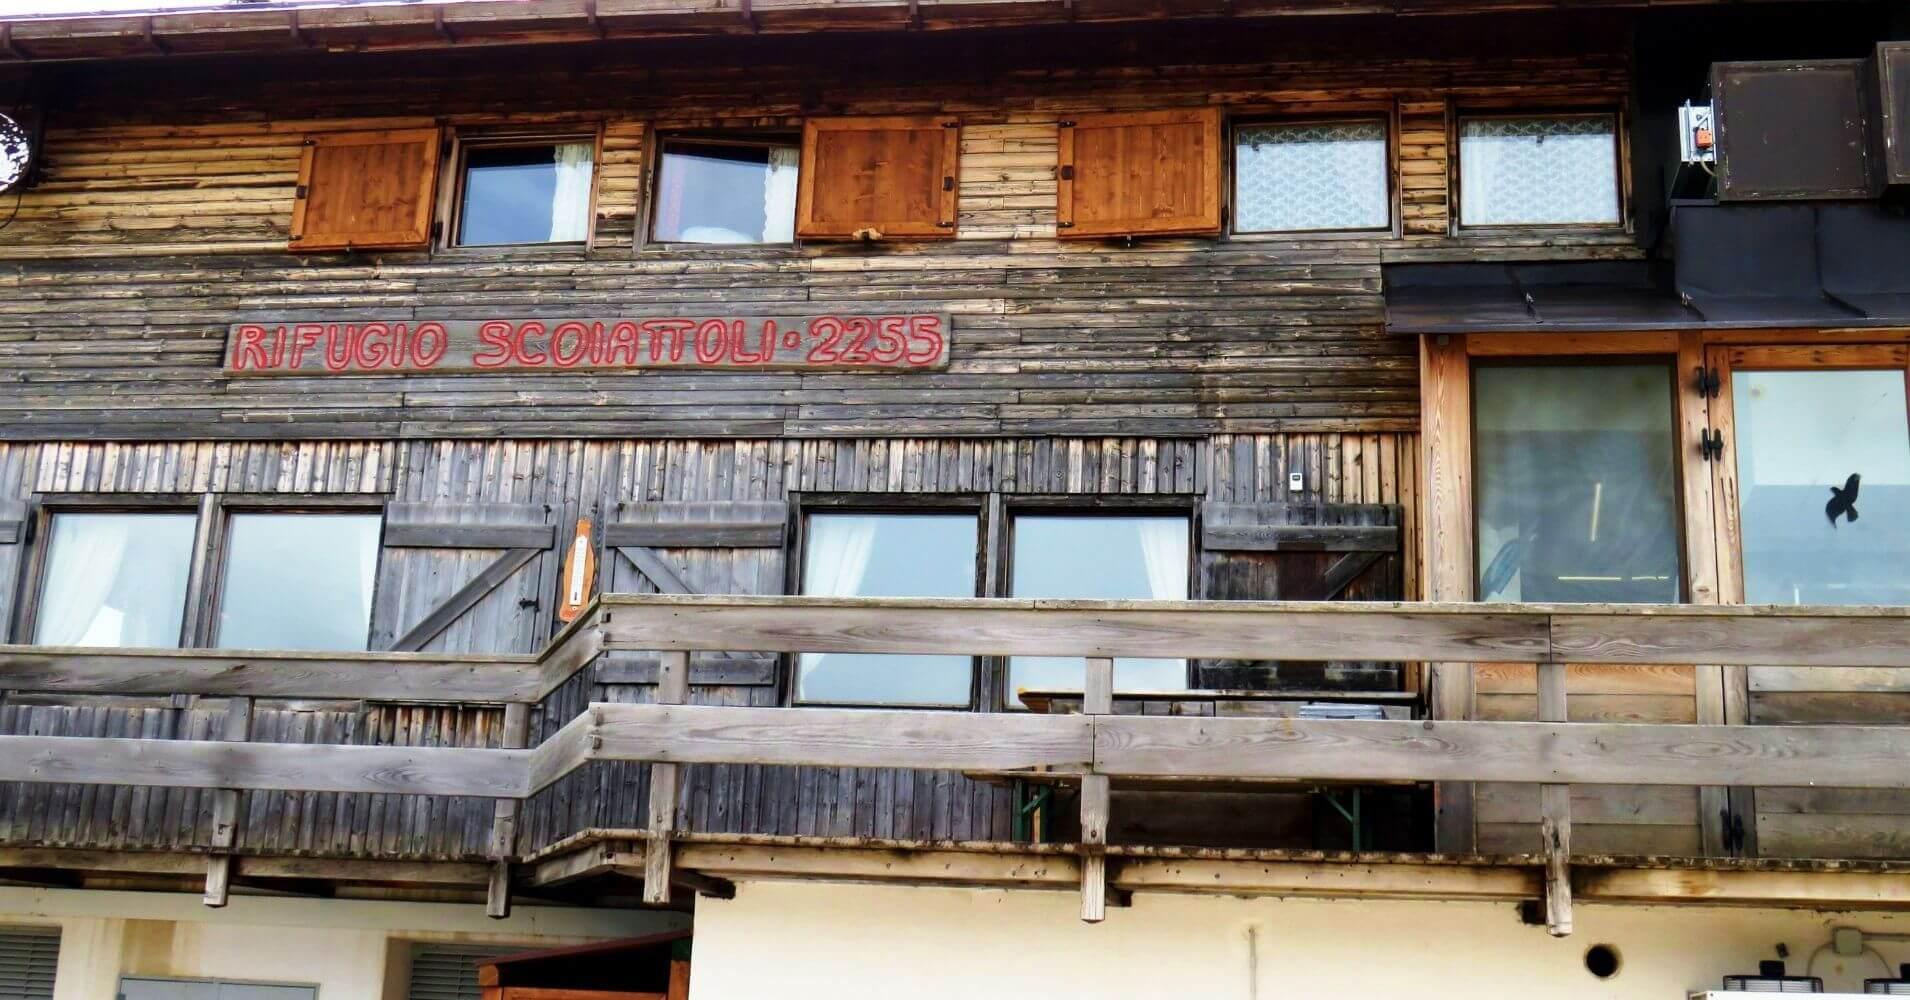 Refugio Scoiatolli. Cique Torri, Cinco Torres. Dolomitas, Cortina d' Ampezzo. Belluno, Véneto. Italia.